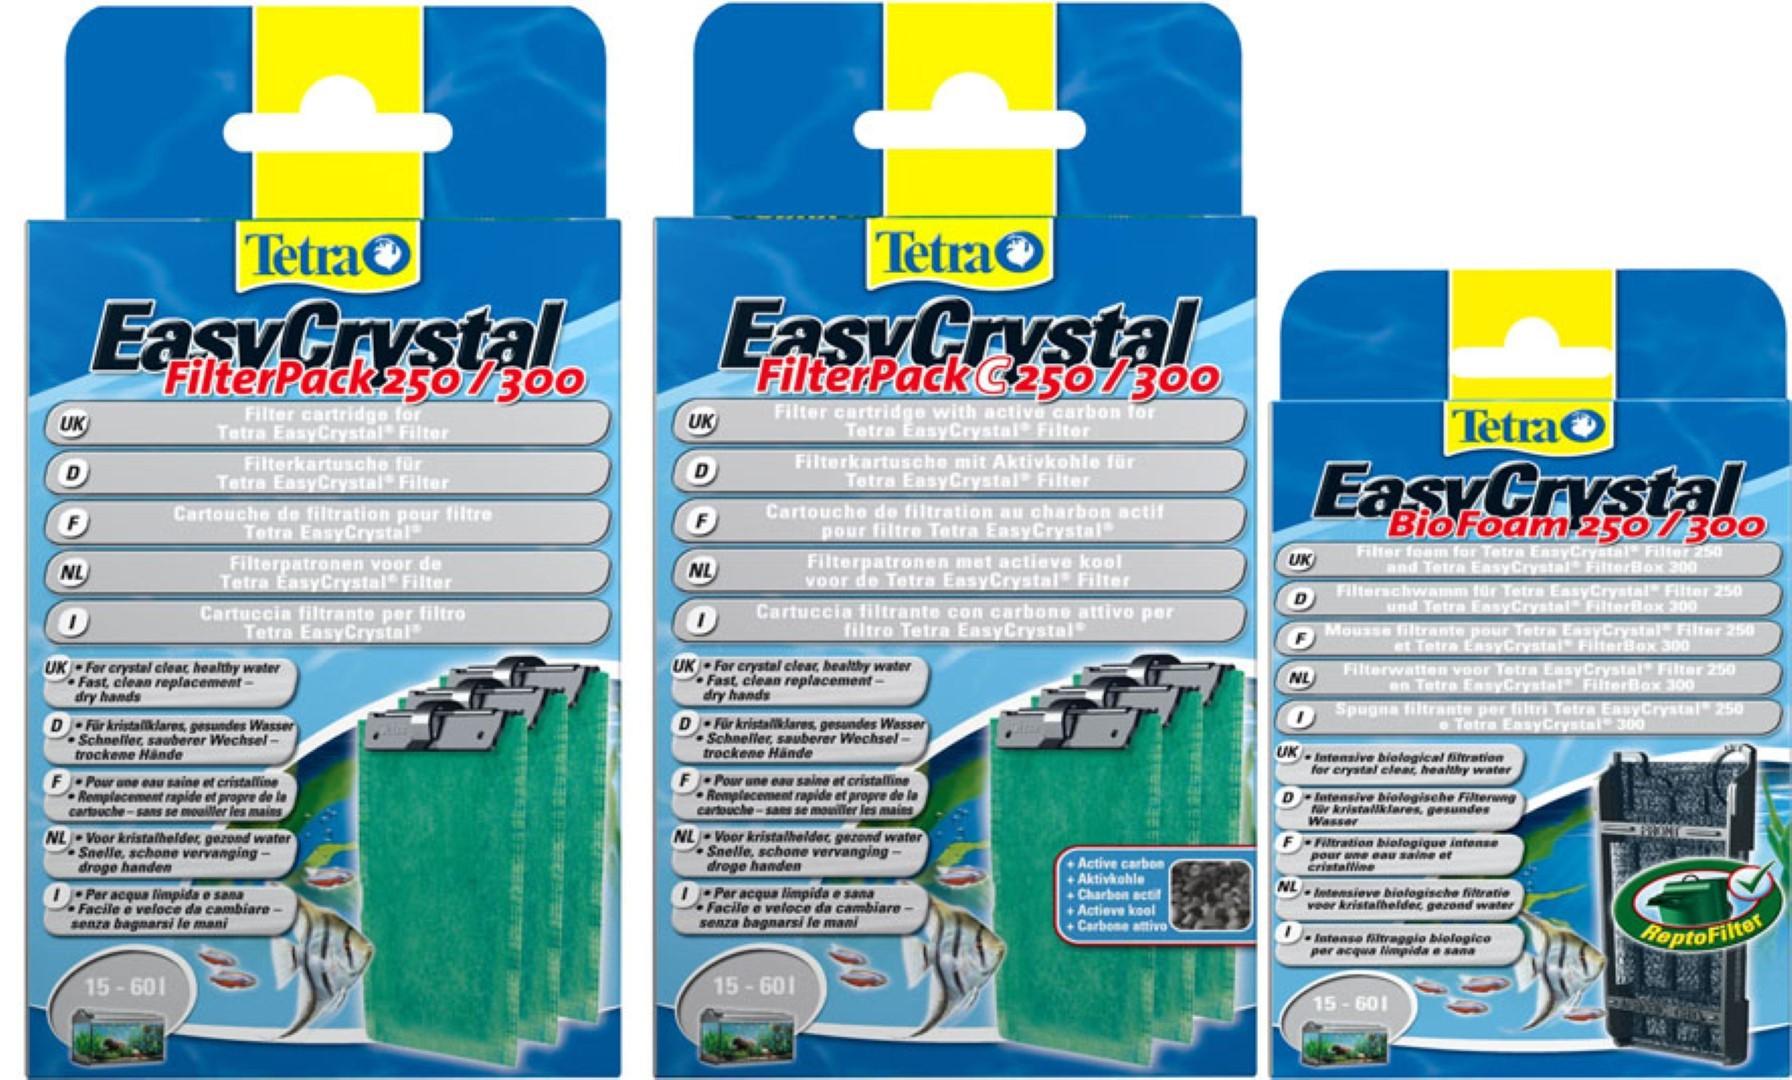 Tetra pak a 3 Easy Crystal filterpack 250/300